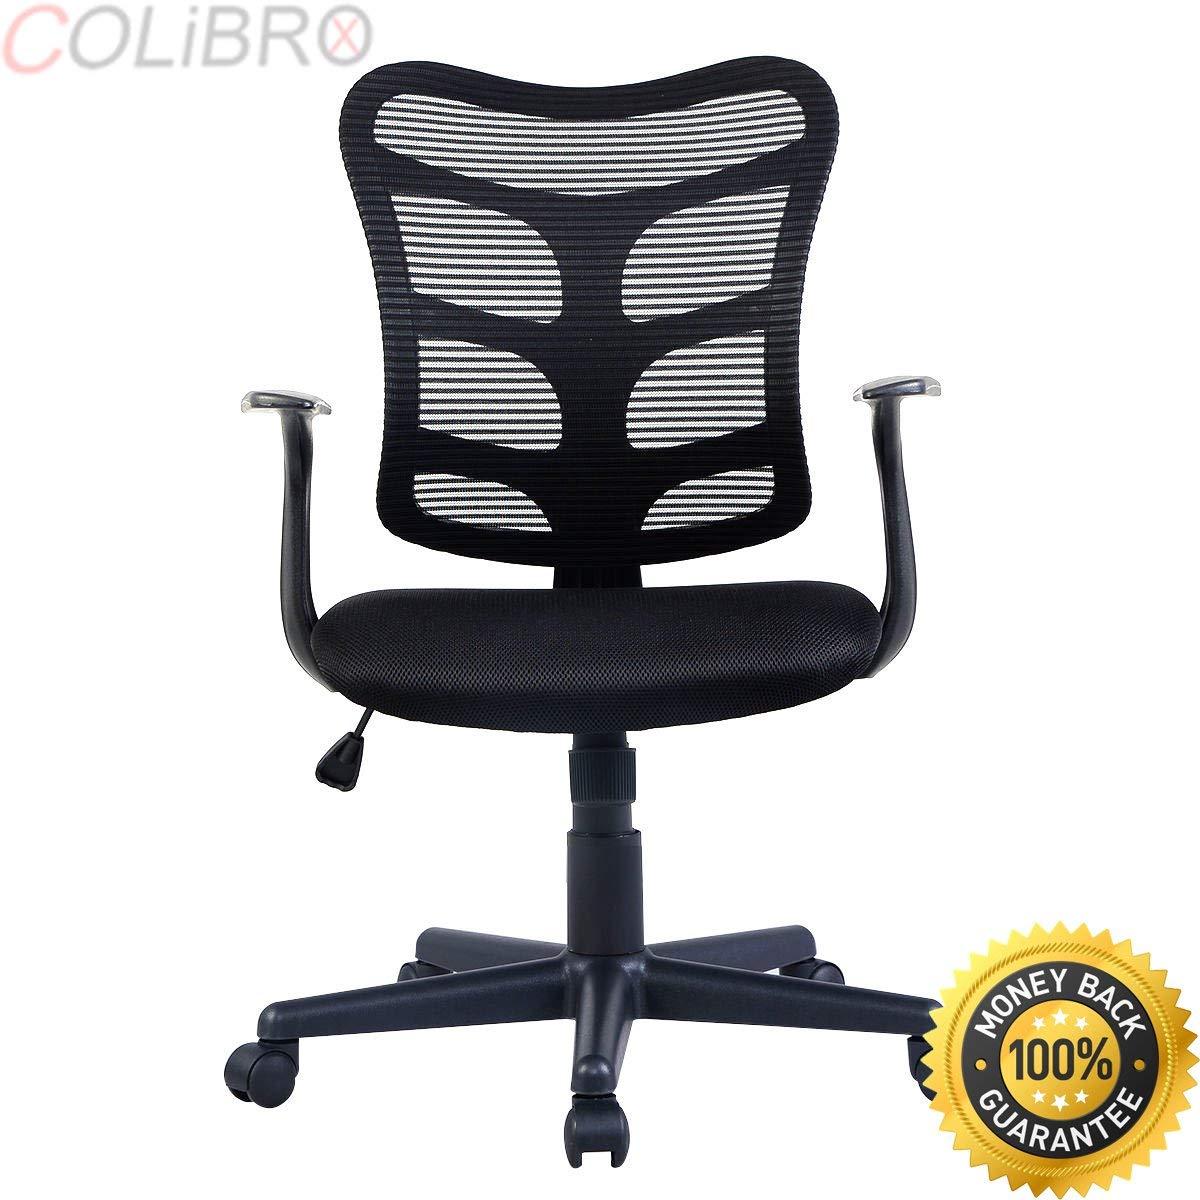 COLIBROX--Modern Ergonomic Mid-Back Executive Computer Desk Task Office Chair Mesh Back. modern ergonomic mesh mid back executive computer desk task office chair. ergonomic chair amazon.